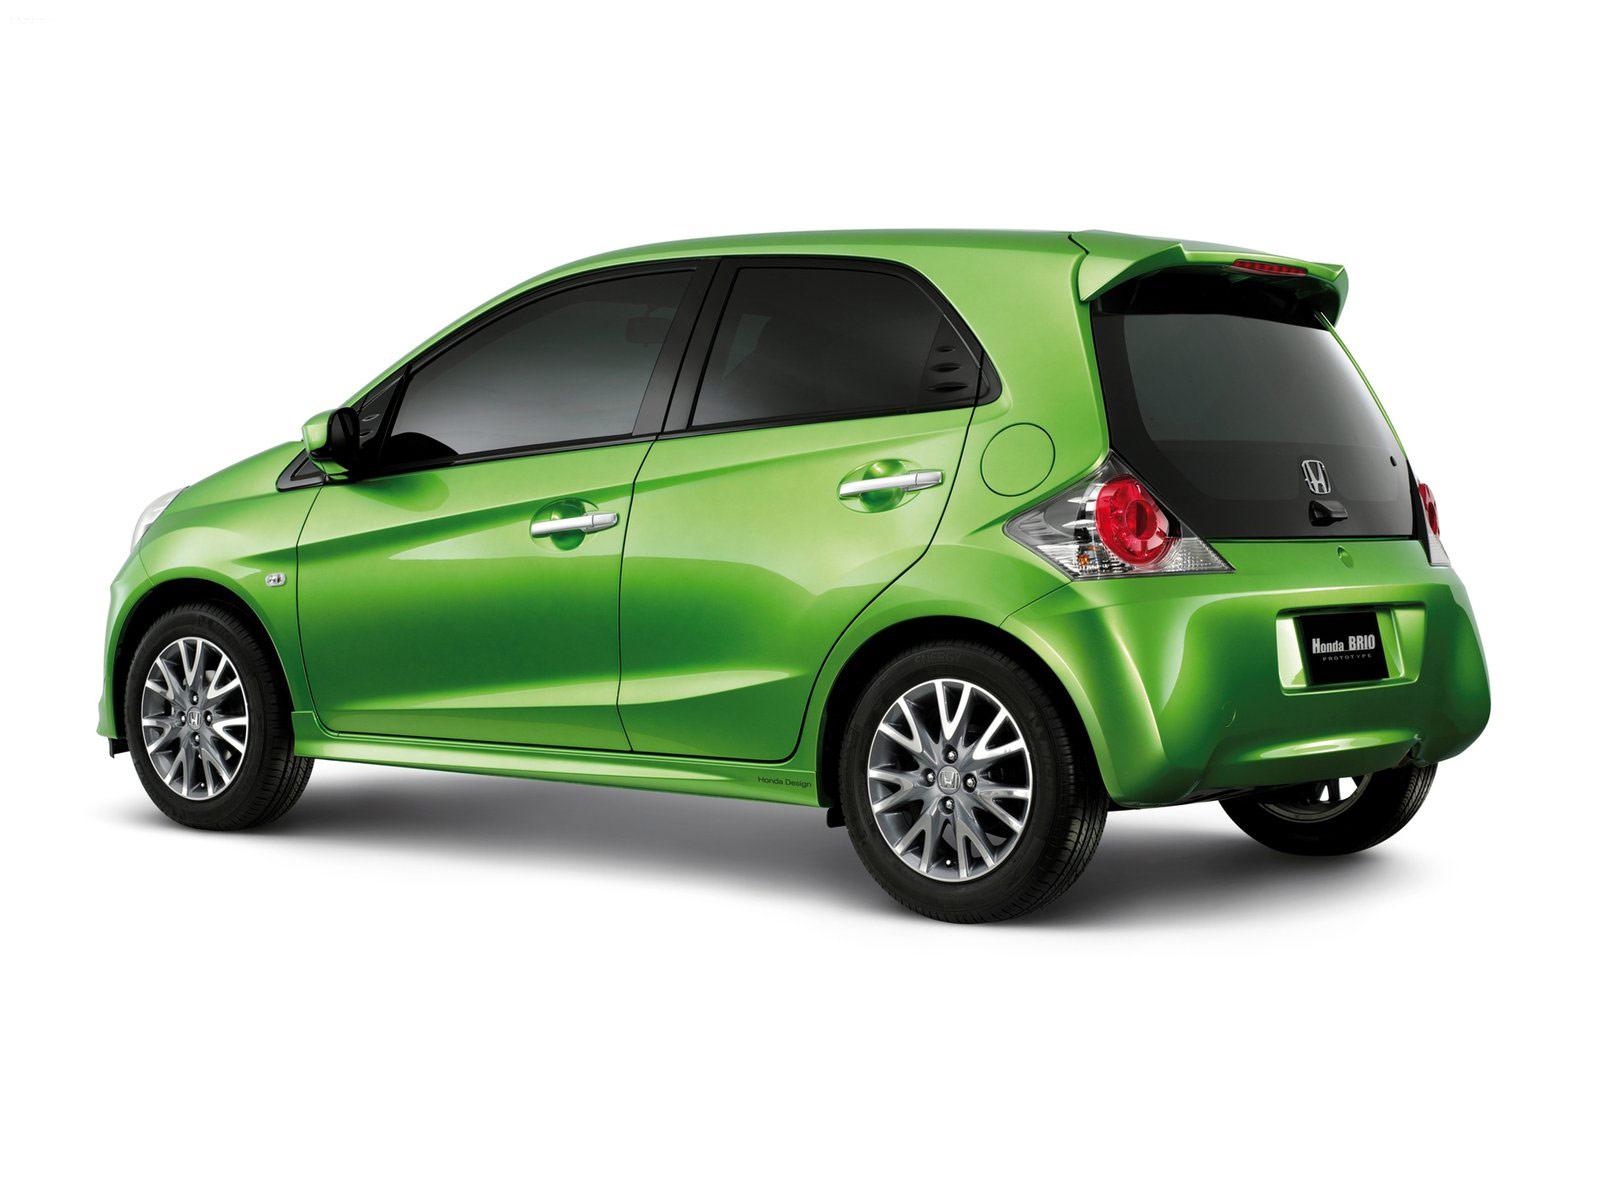 http://4.bp.blogspot.com/-P151YqKWZgQ/TgyN-4jtBrI/AAAAAAAAAEA/UIxUezltdC0/s1600/Honda_Brio_Concept_Green.jpg